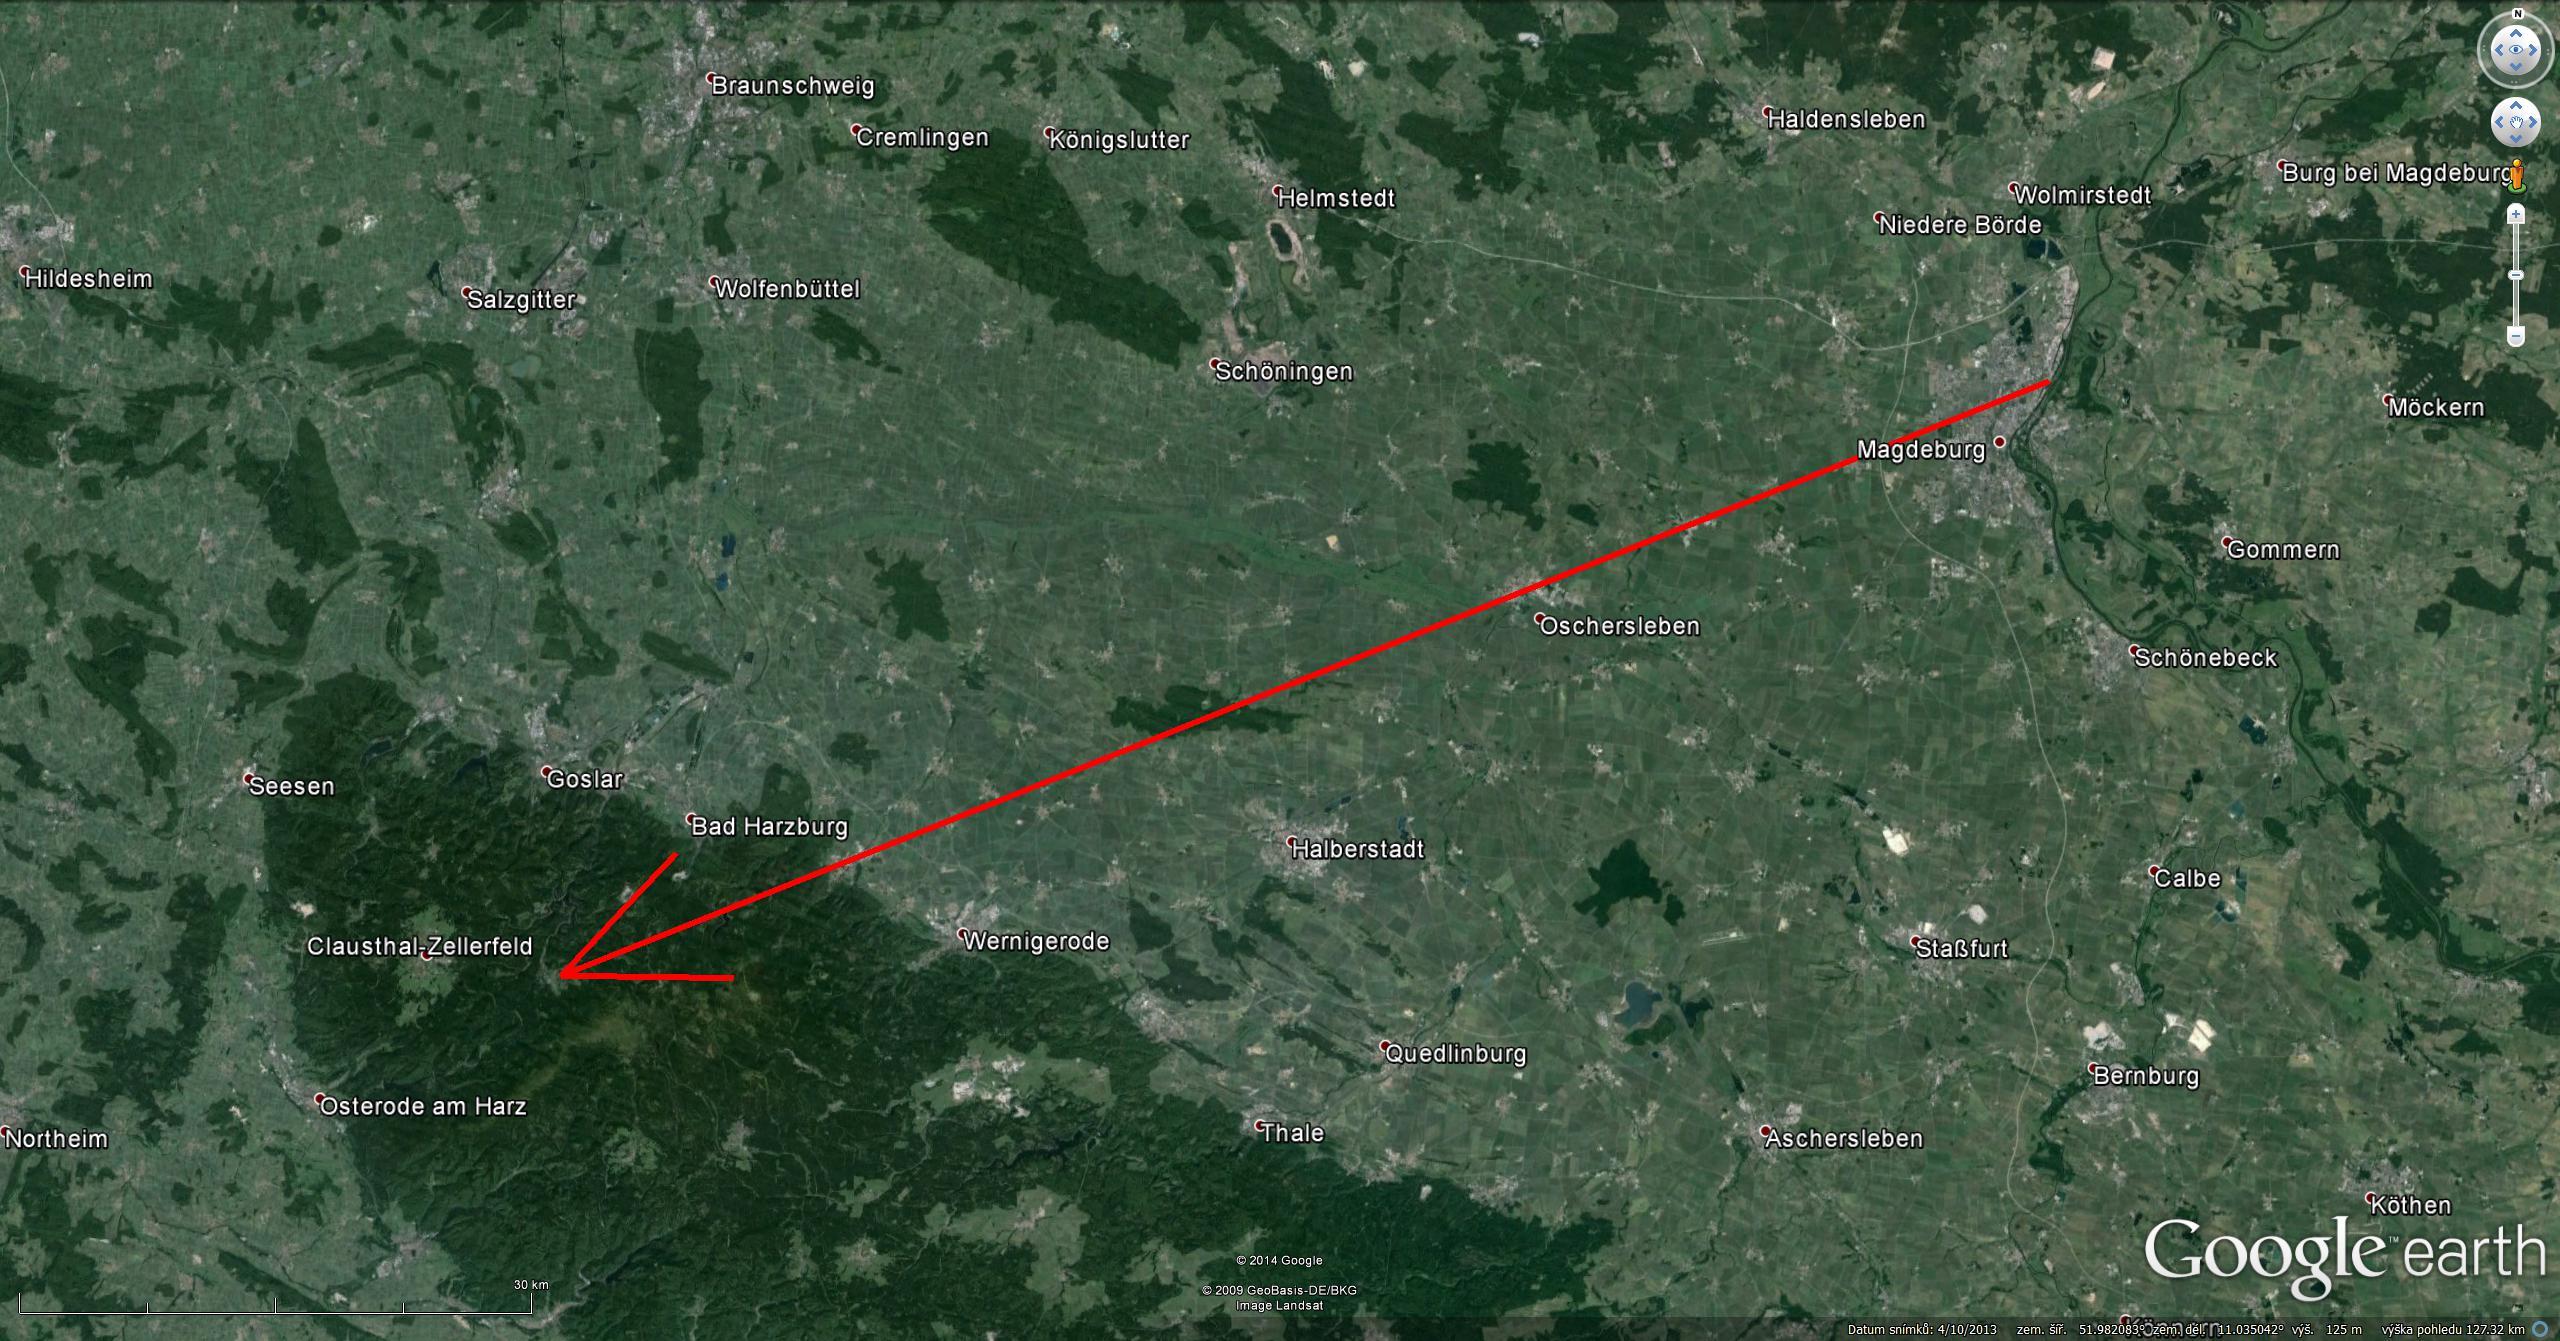 Atmosférická dráha bolidu z 13. srpna 2014